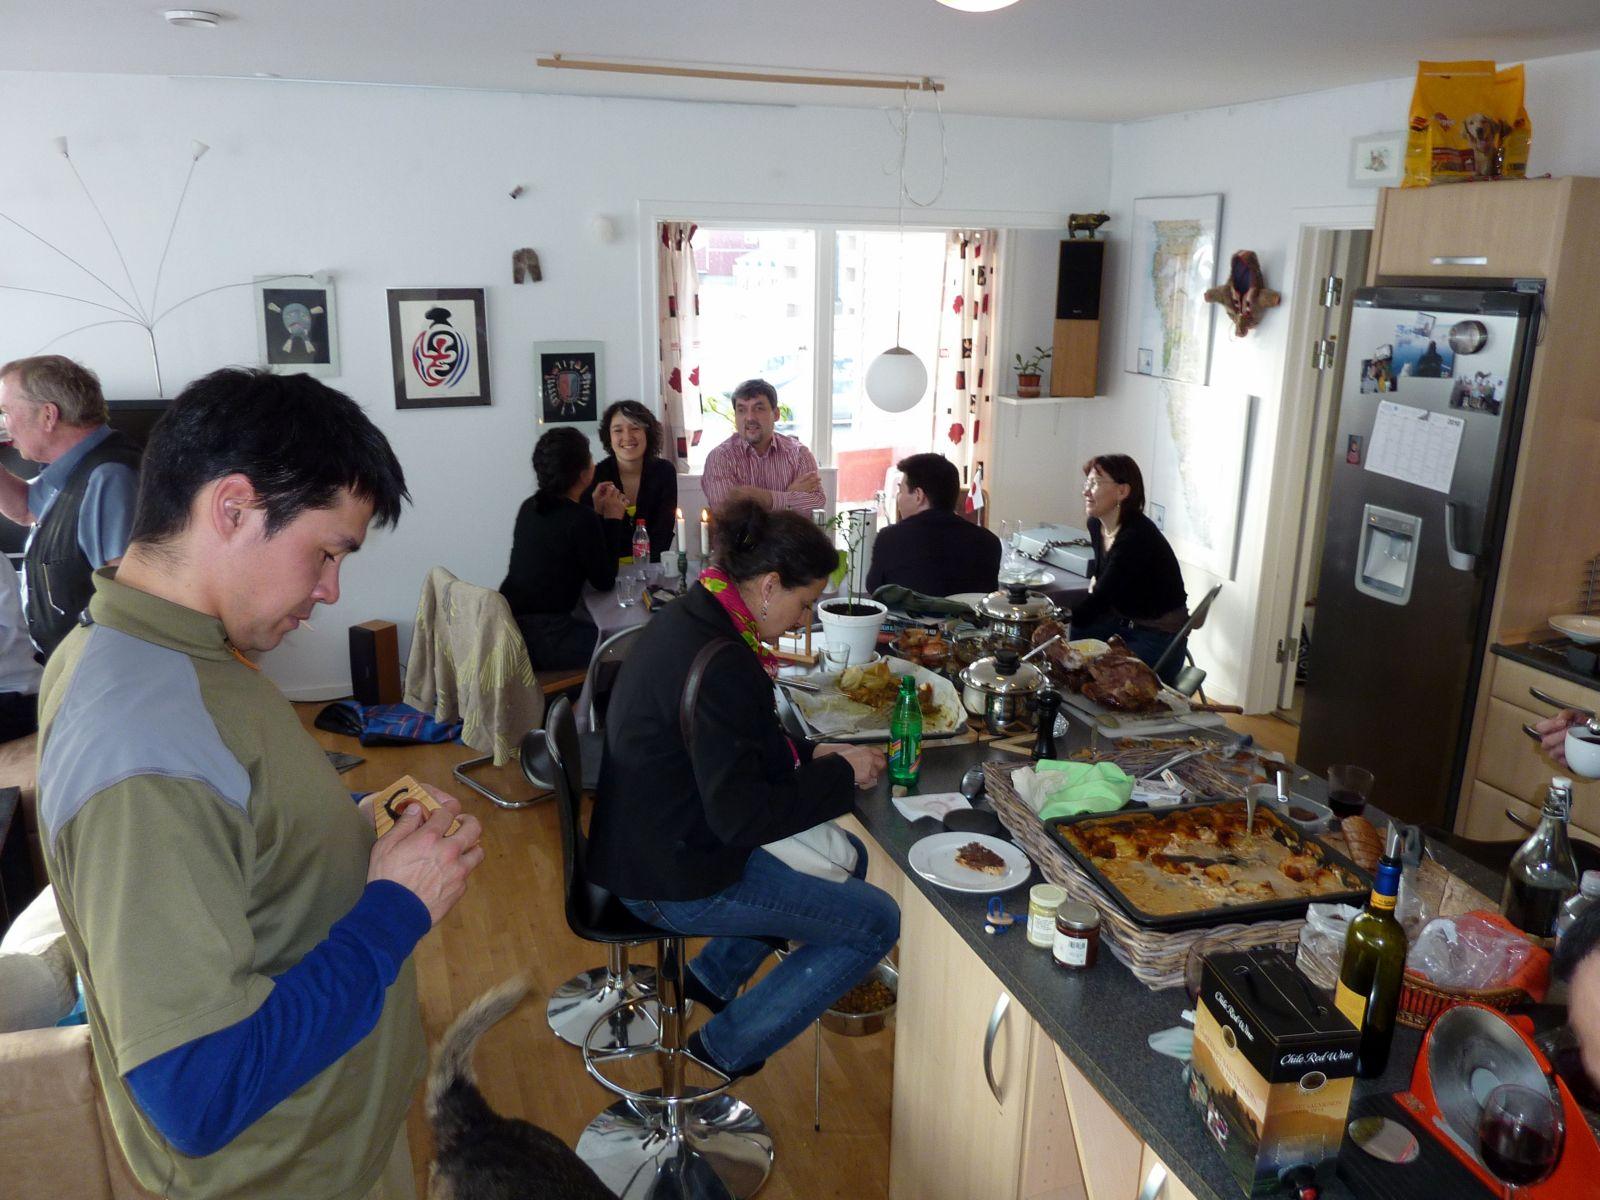 2010-04-05-1834_-_Ivalo Lynge Labansen; Janus; Jeanette Holding; John Telling; Martha Labansen; Nuka Klausen Telling;